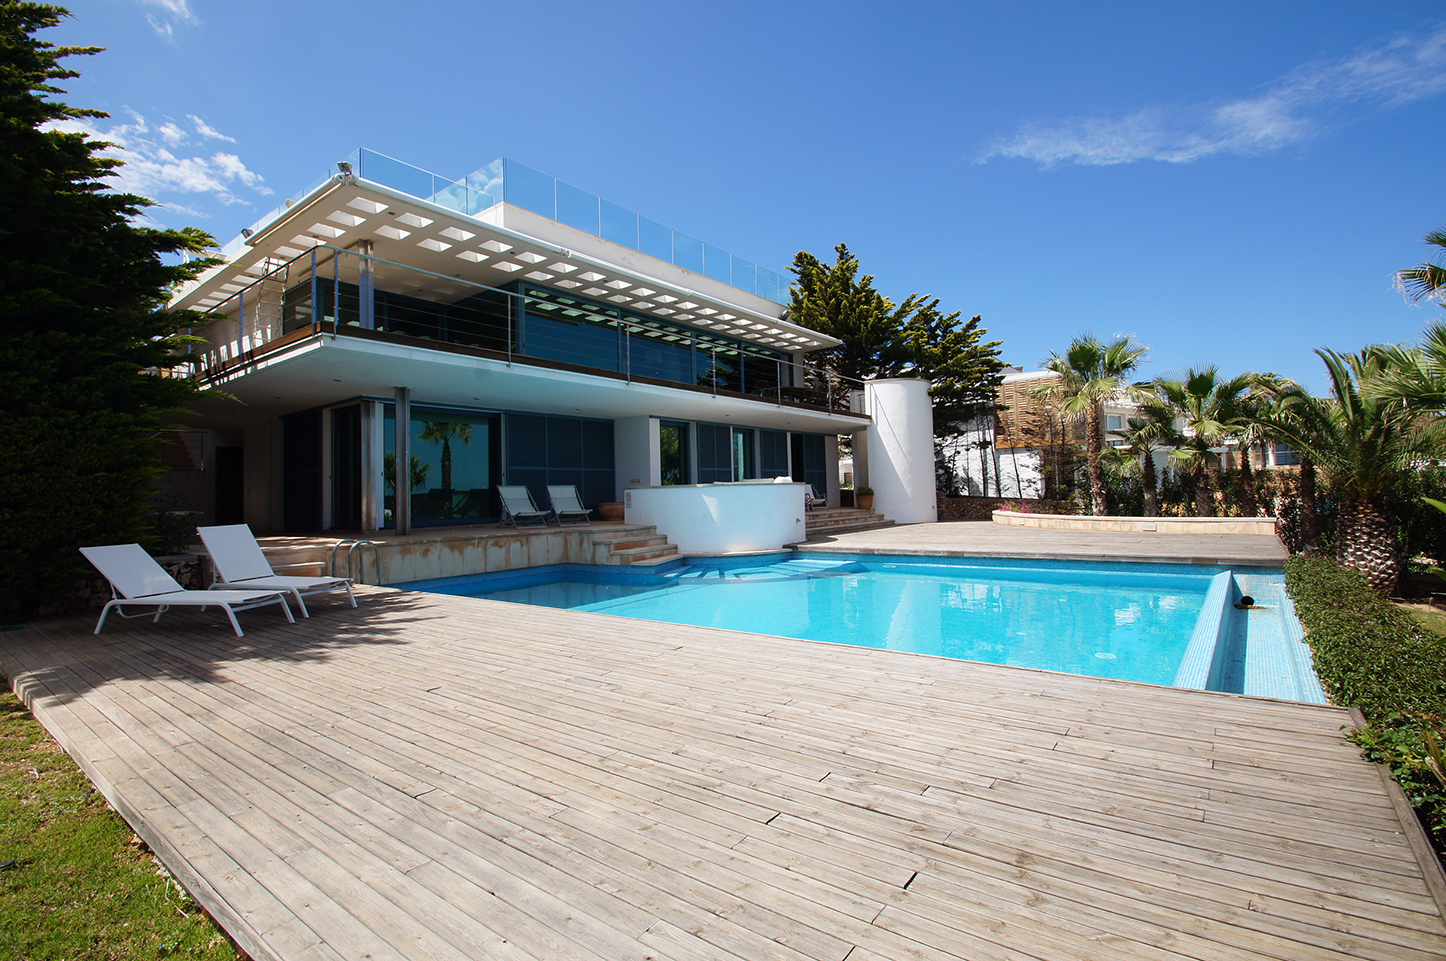 Vacanze in villa 2021 a Minorca